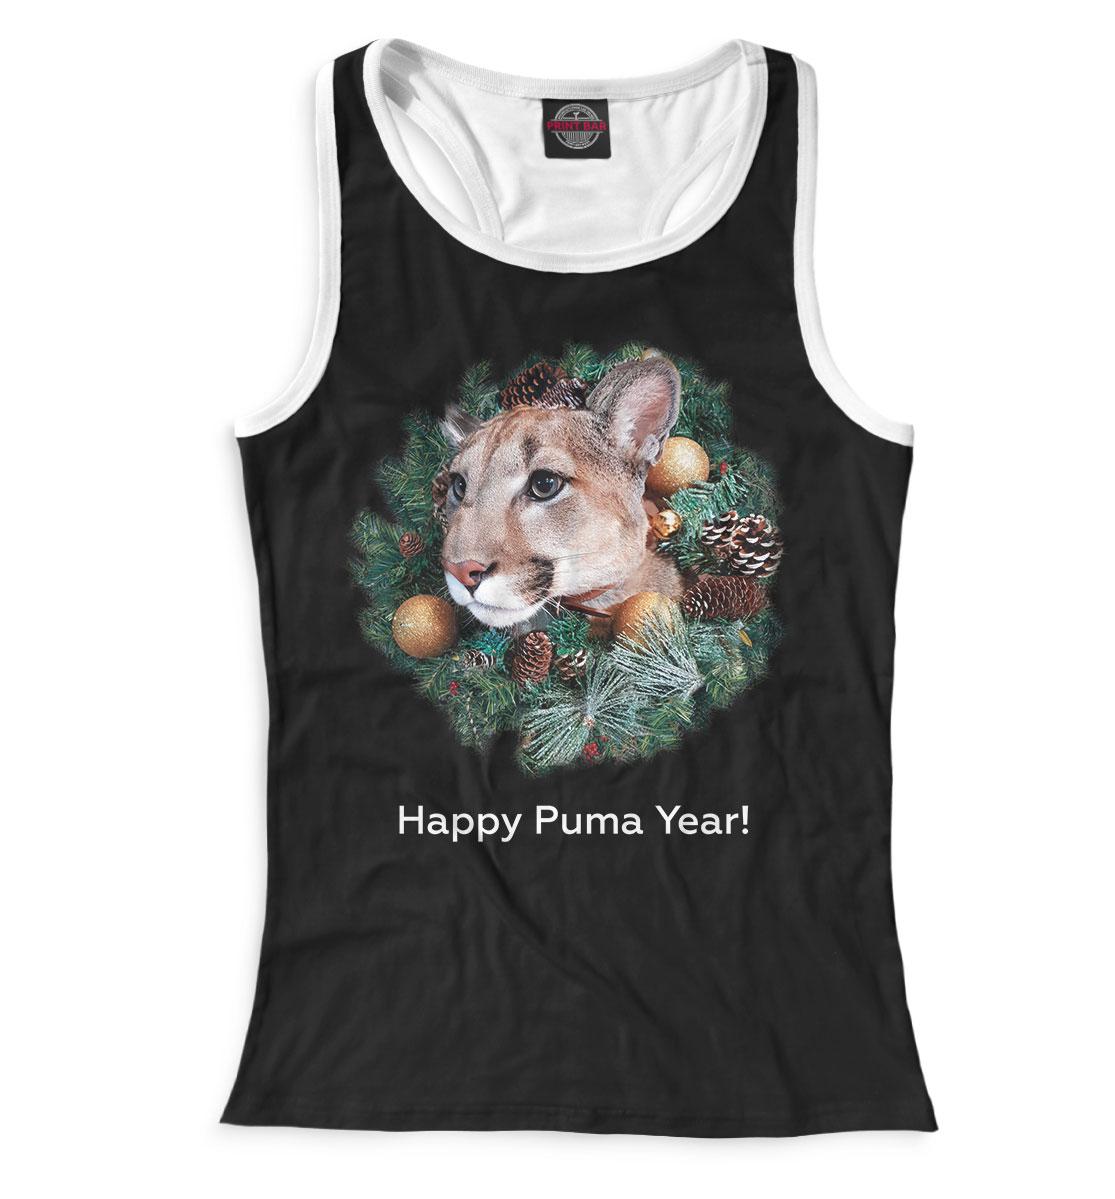 Фото - Happy Puma Year! puma часы puma pu102592005 коллекция sport